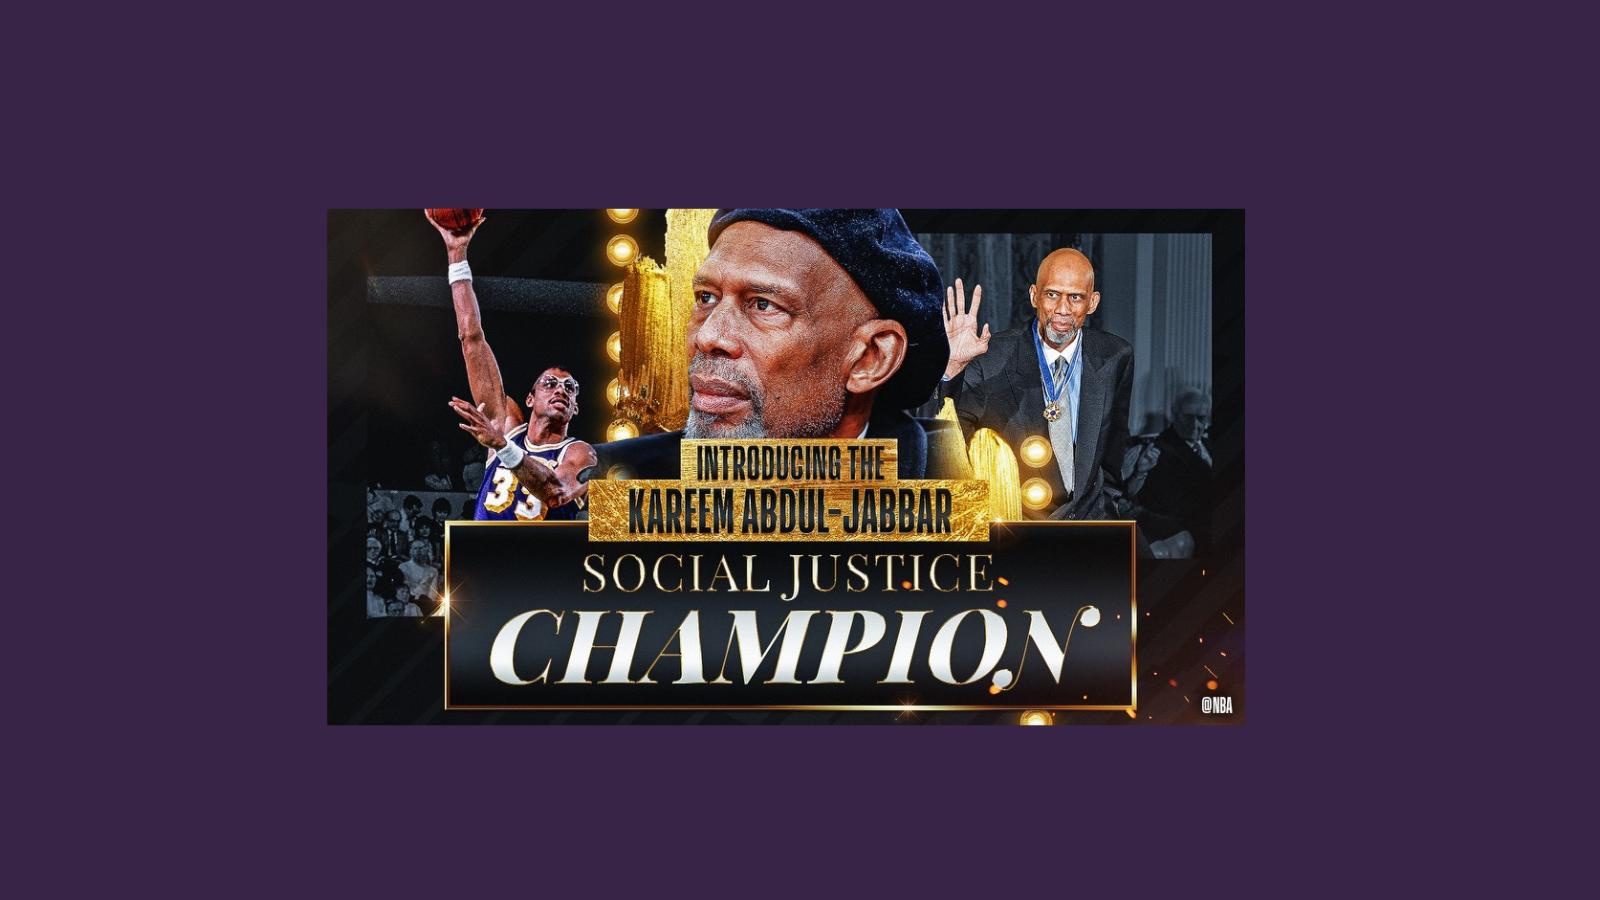 Kareem Abdul-Jabbar Social Justice Champion